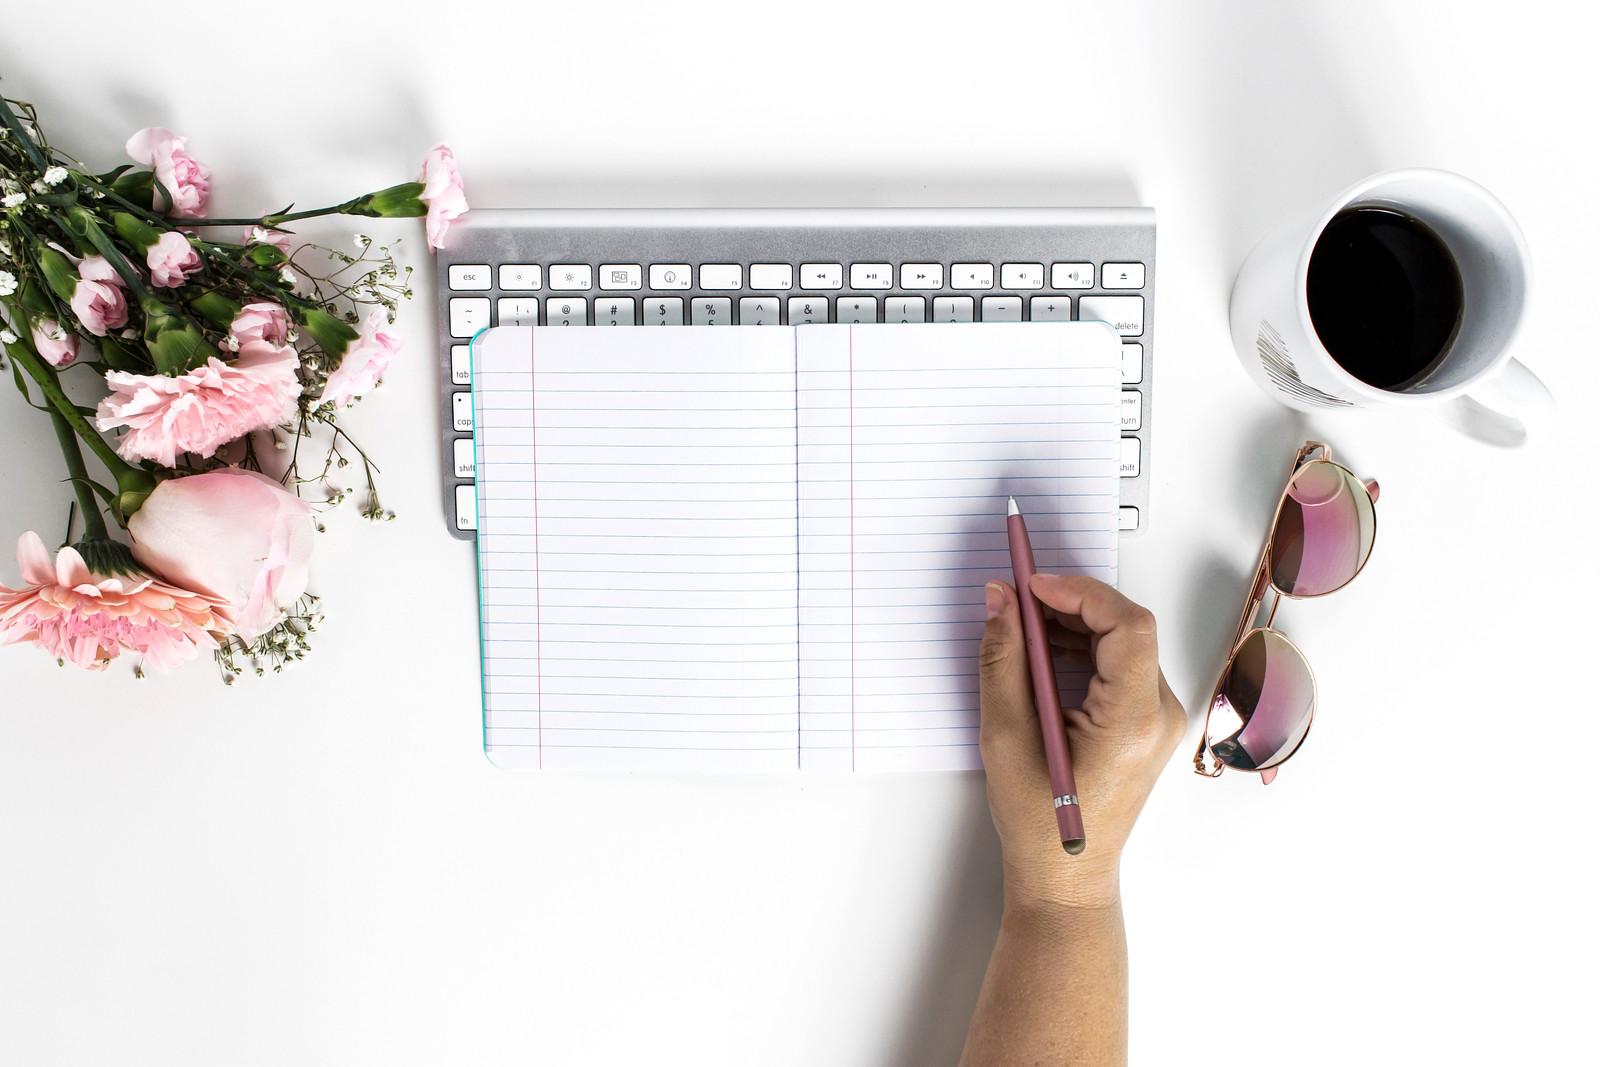 hand holding pen near notebook on desk